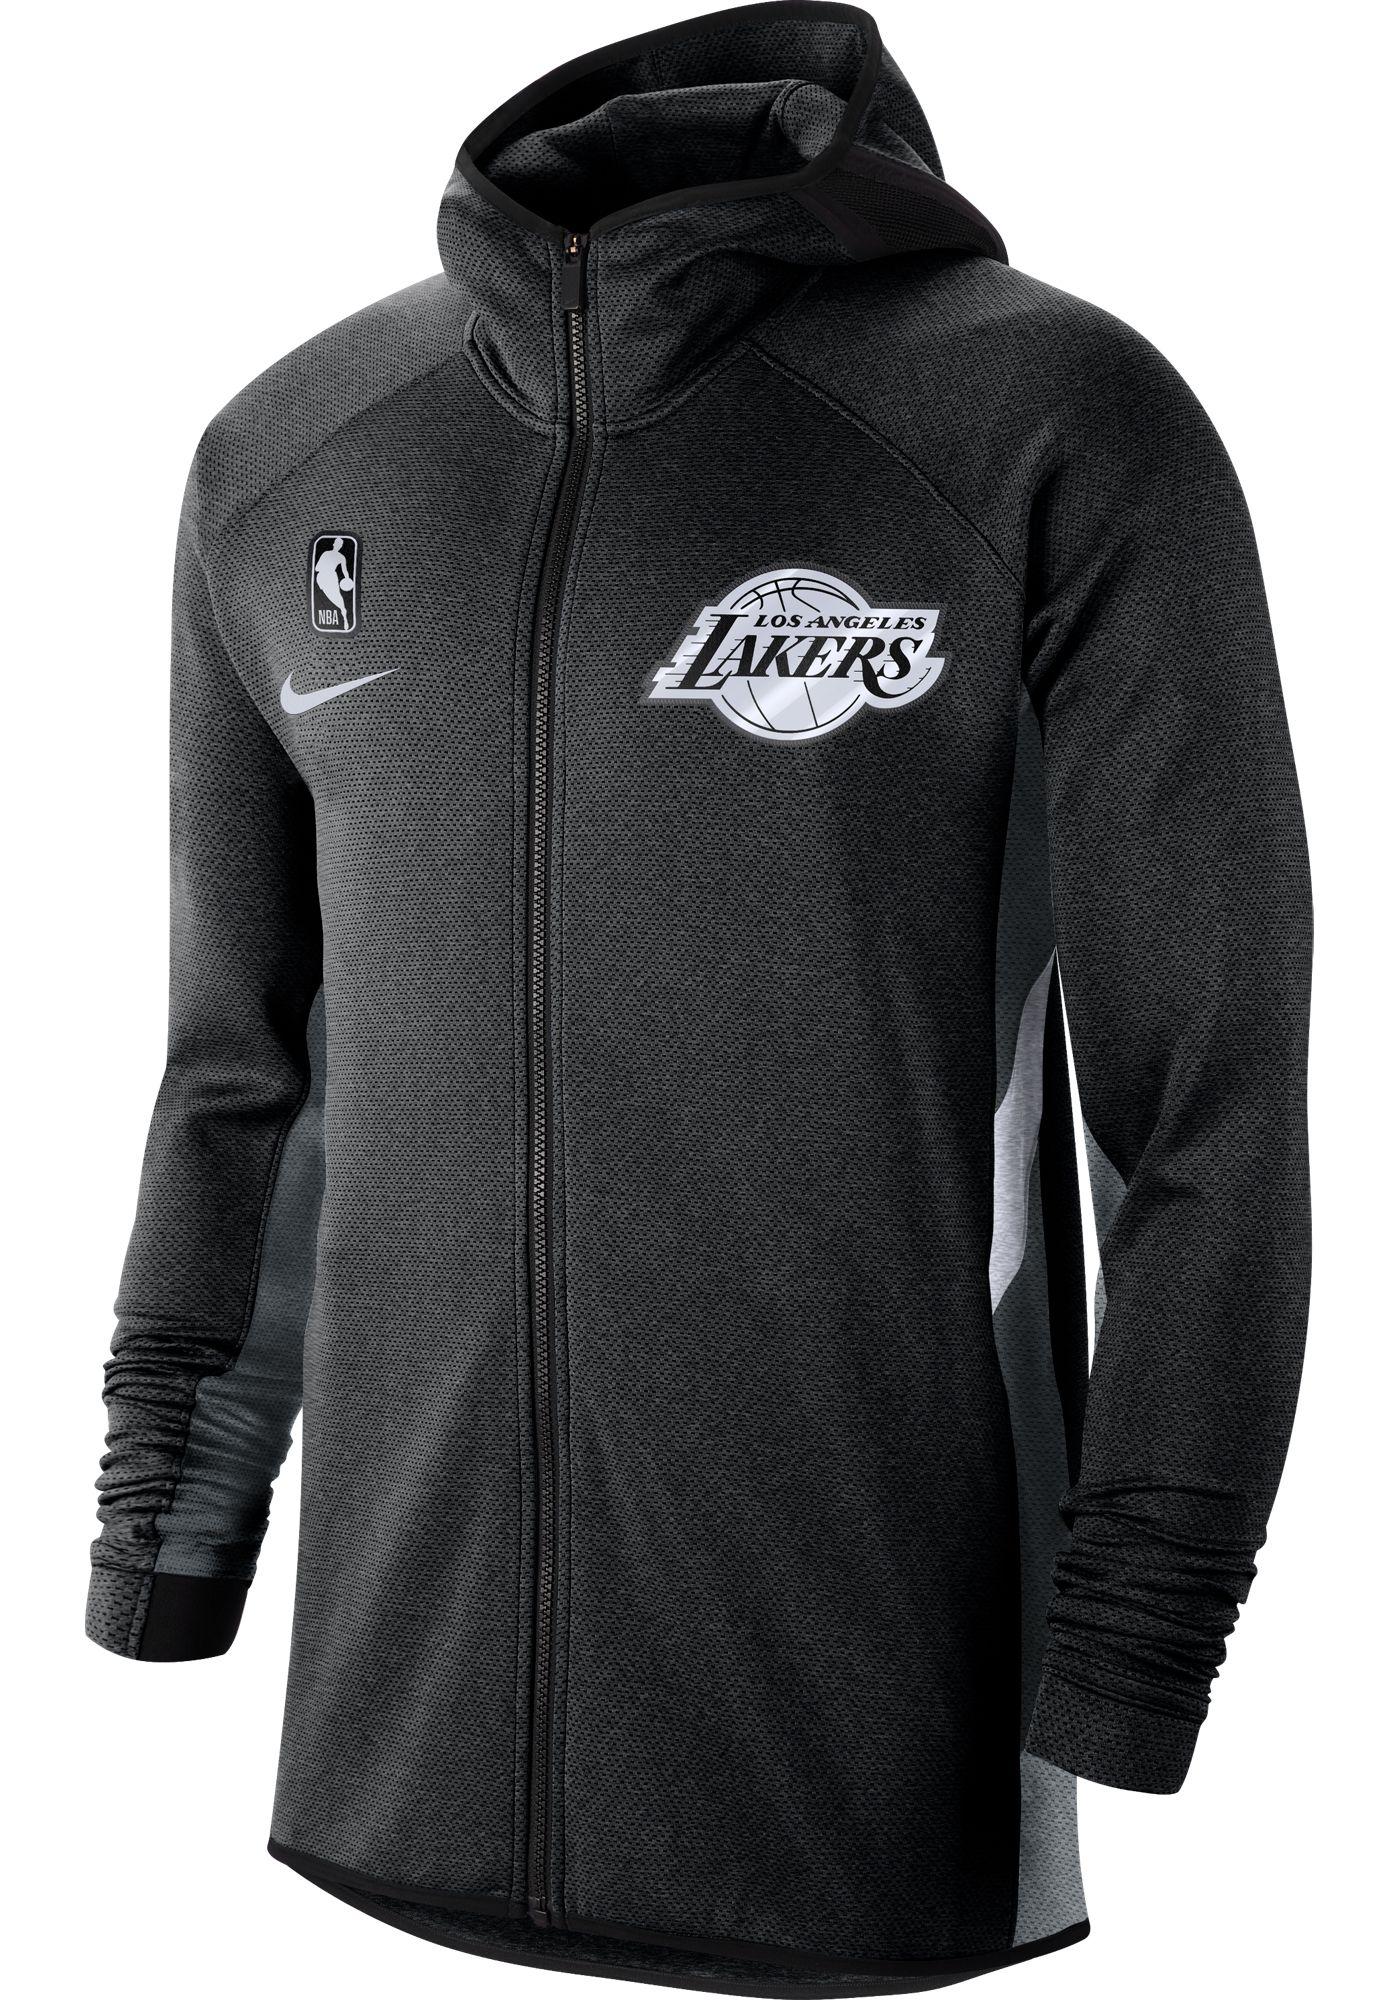 Nike Men's Los Angeles Lakers On-Court Therma Flex Showtime Full-Zip Hoodie